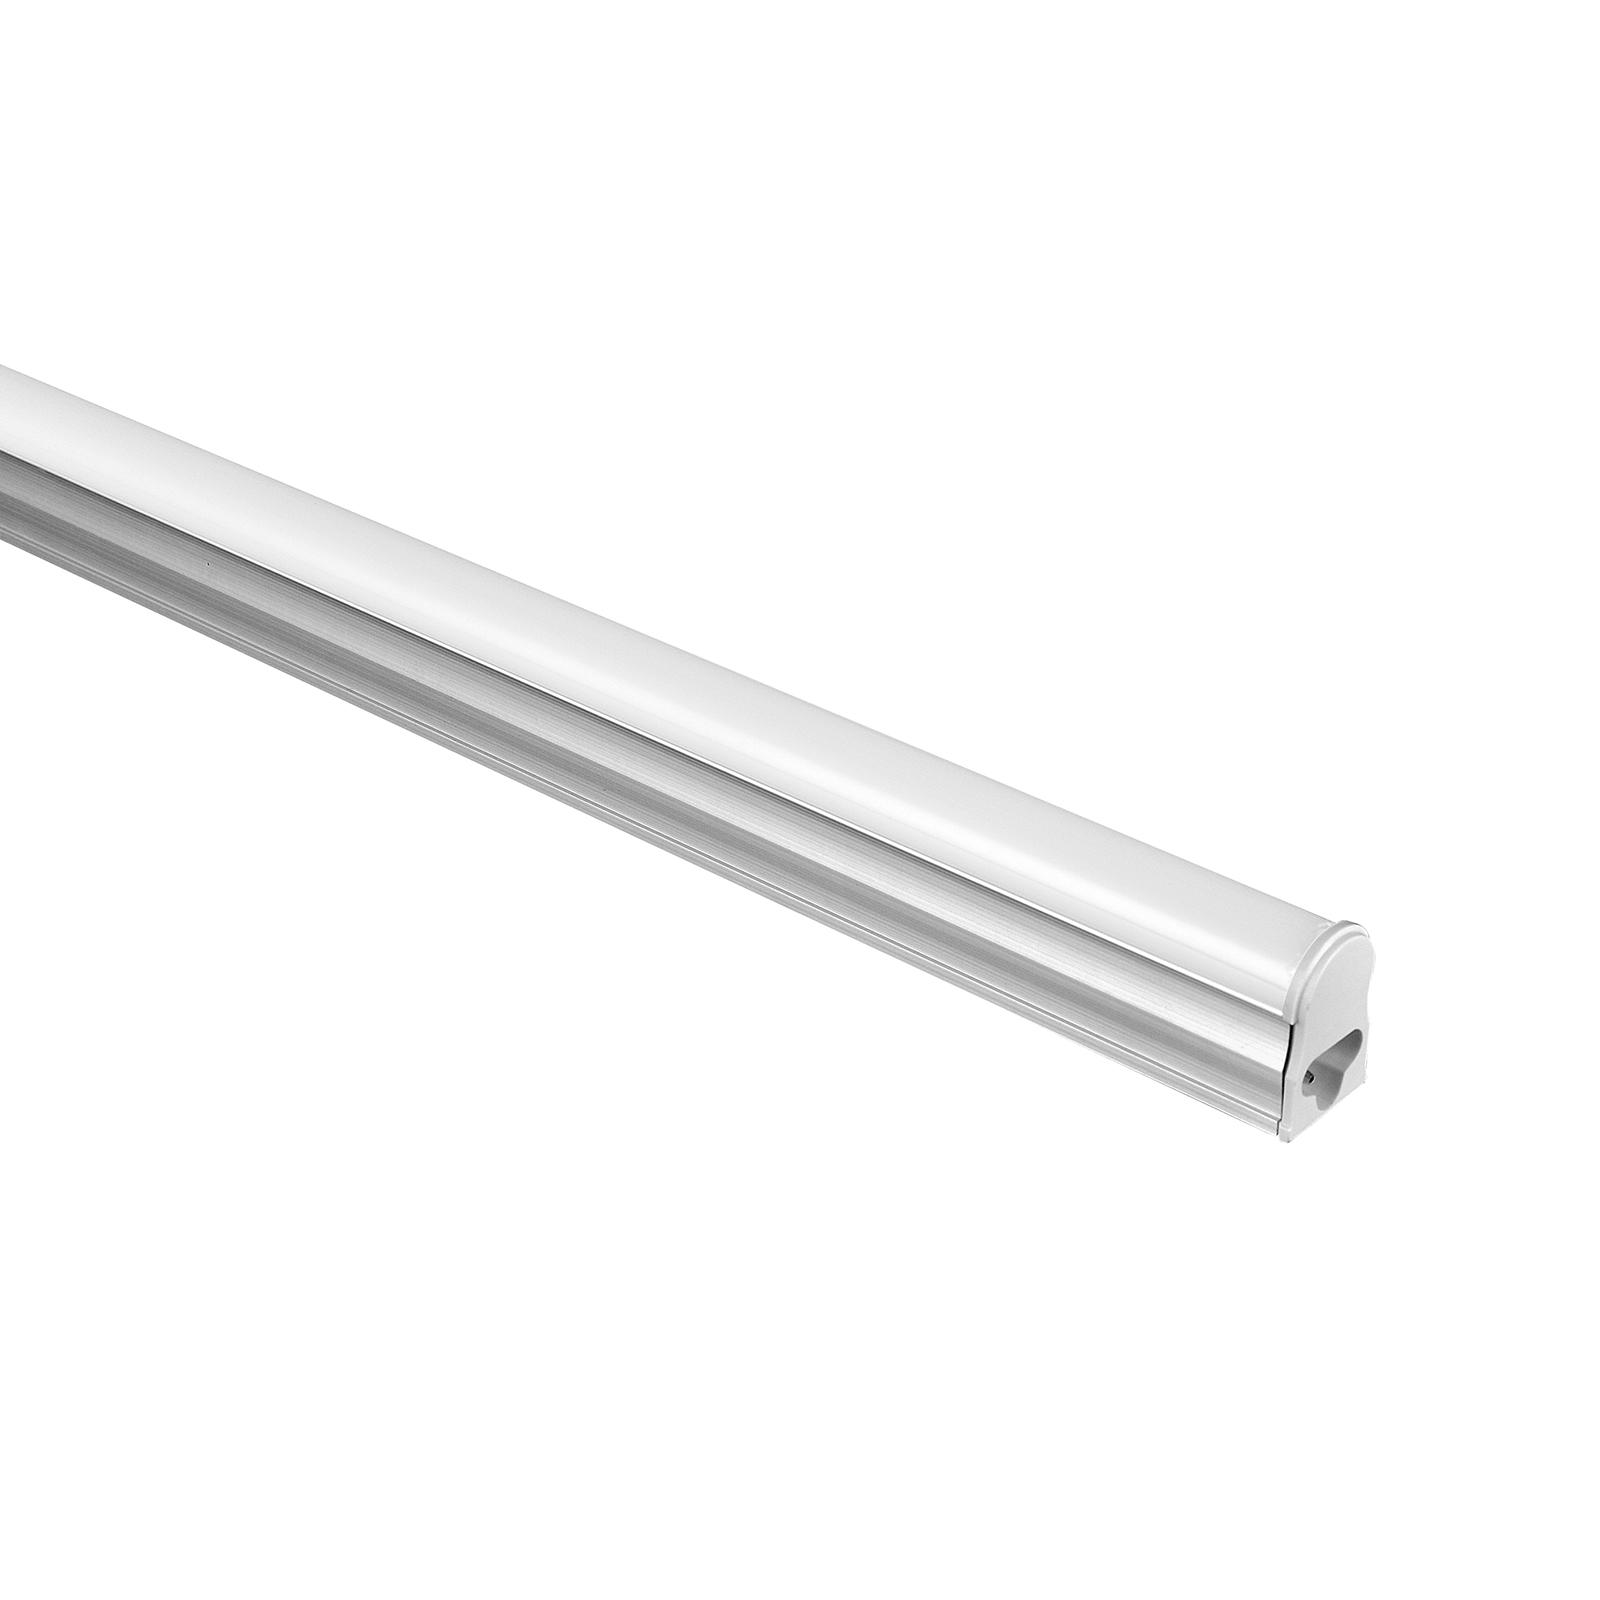 neon led t5 21w plafoniera sottopensile 120cm luce naturale reglette tubo 4000k ebay. Black Bedroom Furniture Sets. Home Design Ideas